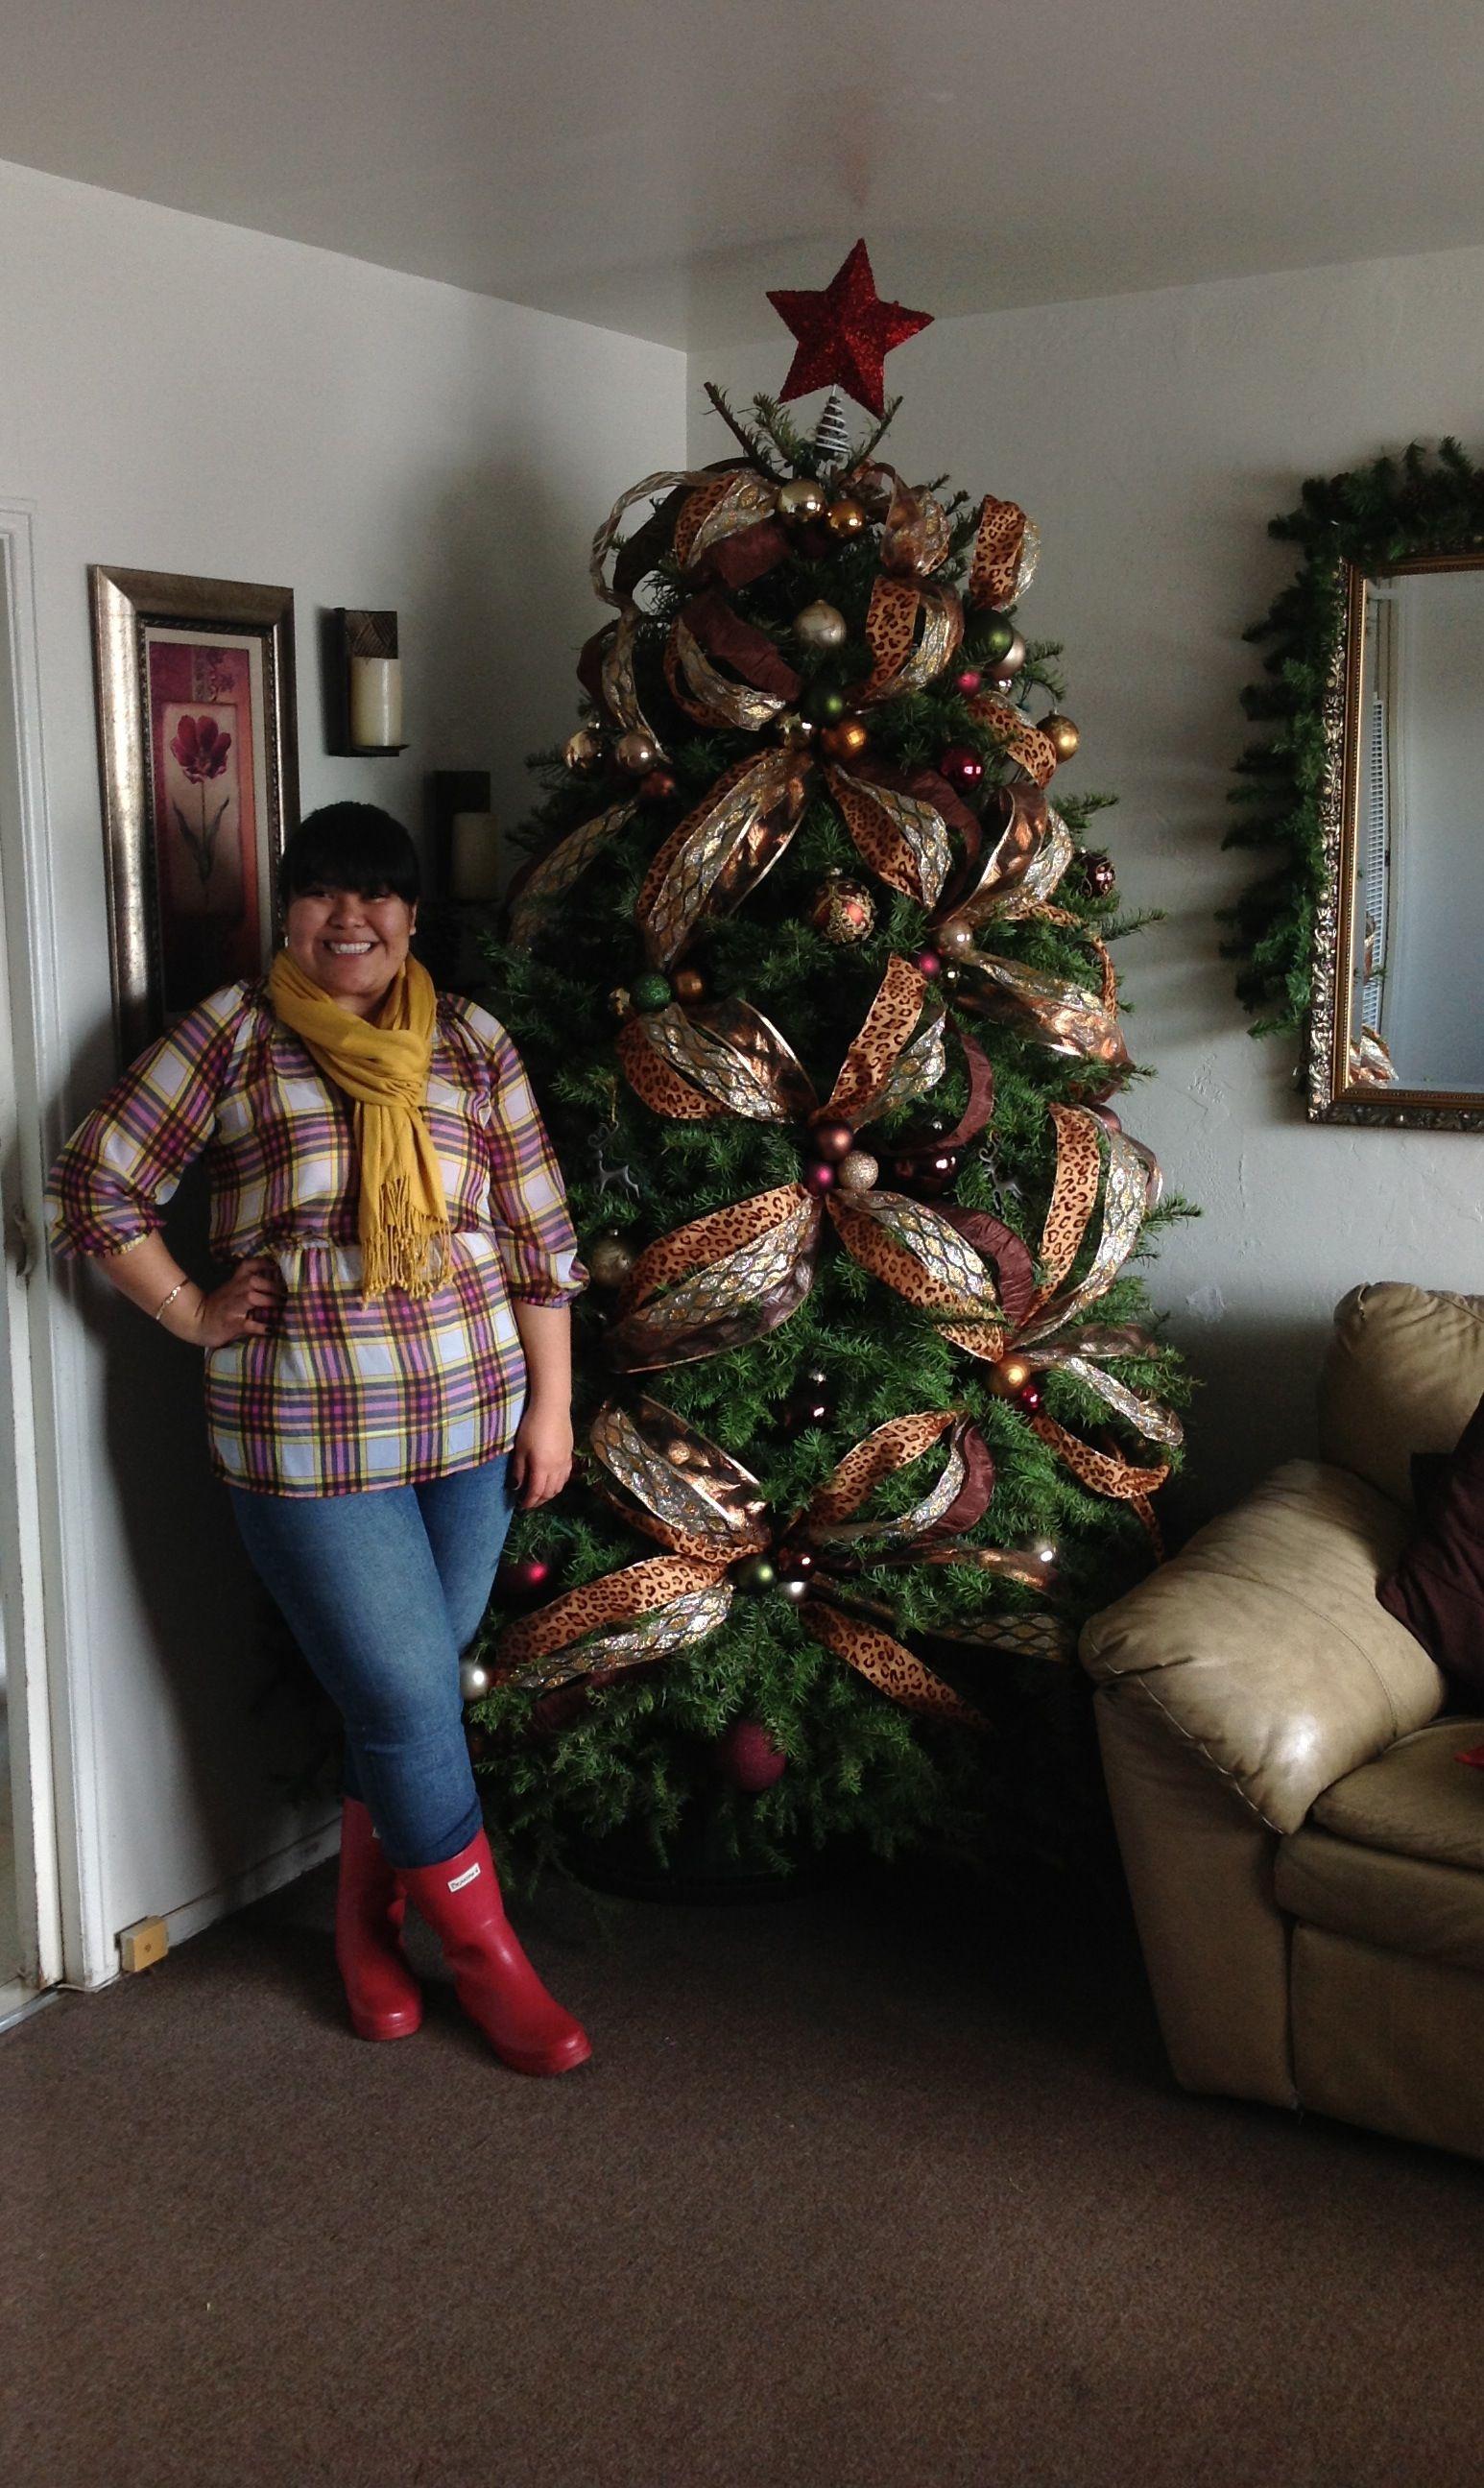 Christmas Craft Ideas 2012 Part - 27: My Leopard Christmas Tree 2012 · Christmas DecorationsChristmas  CraftsChristmas IdeasOffice ...